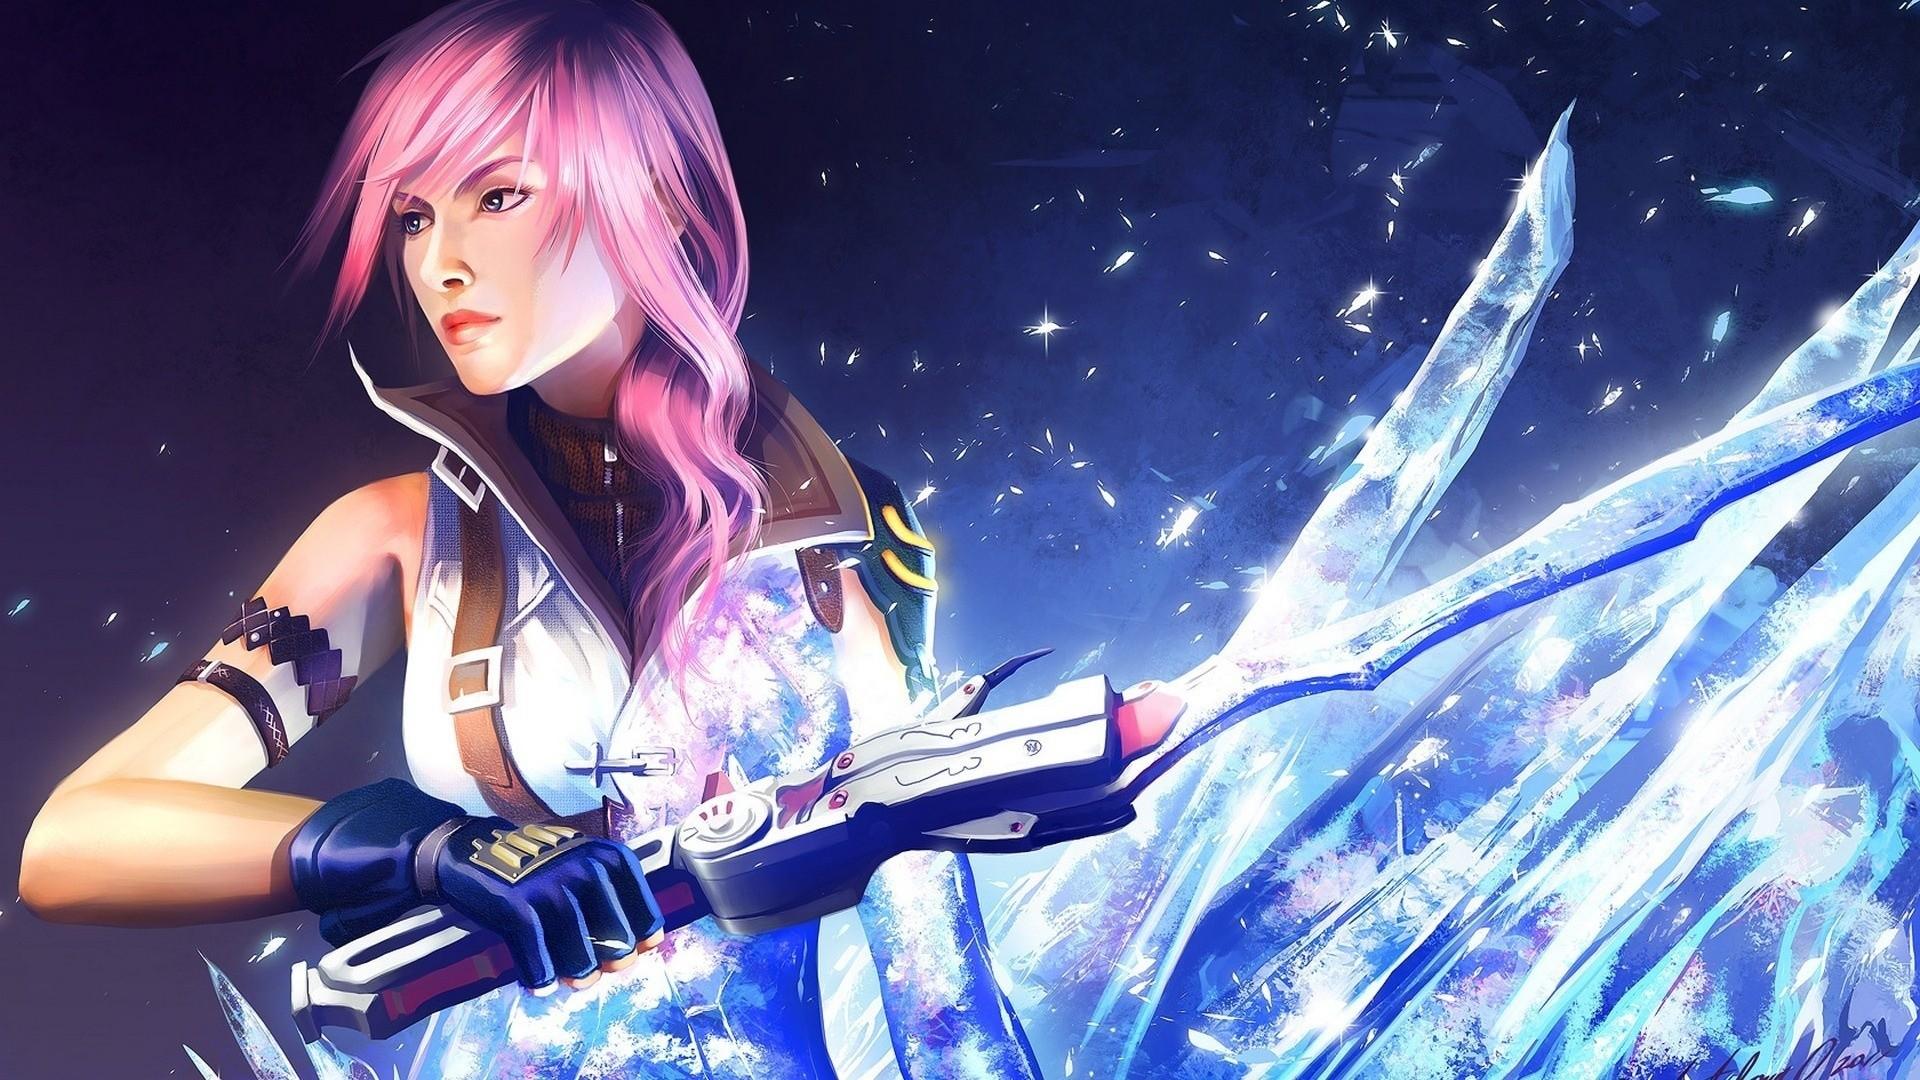 <b>Girl</b> With <b>Sword Wallpaper</